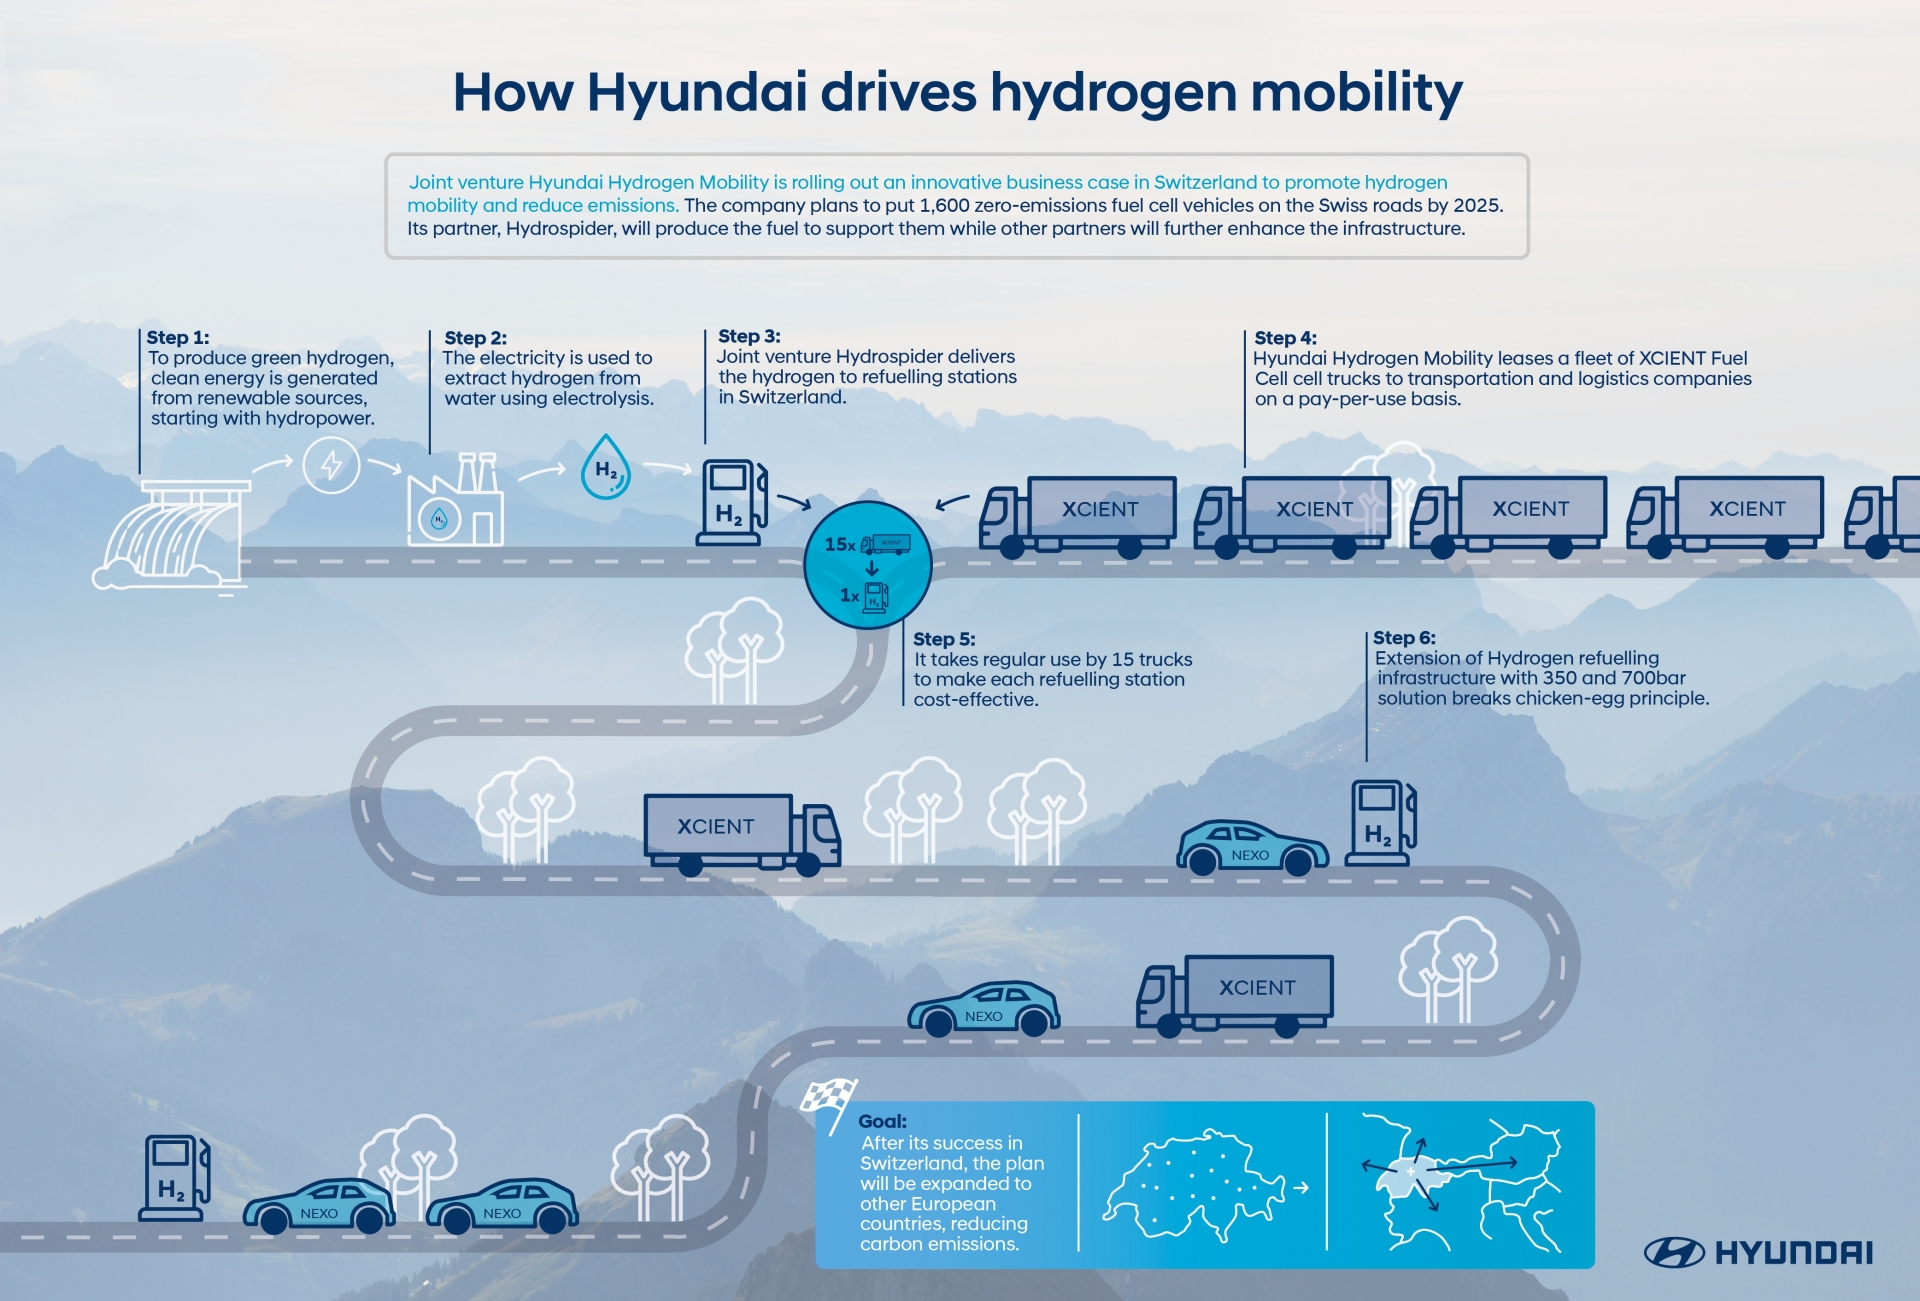 Hyundai Hydrogen Mobility удостоено награды Watt d'Or 2021 за вклад в декарбонизацию энергетики Швейцарии